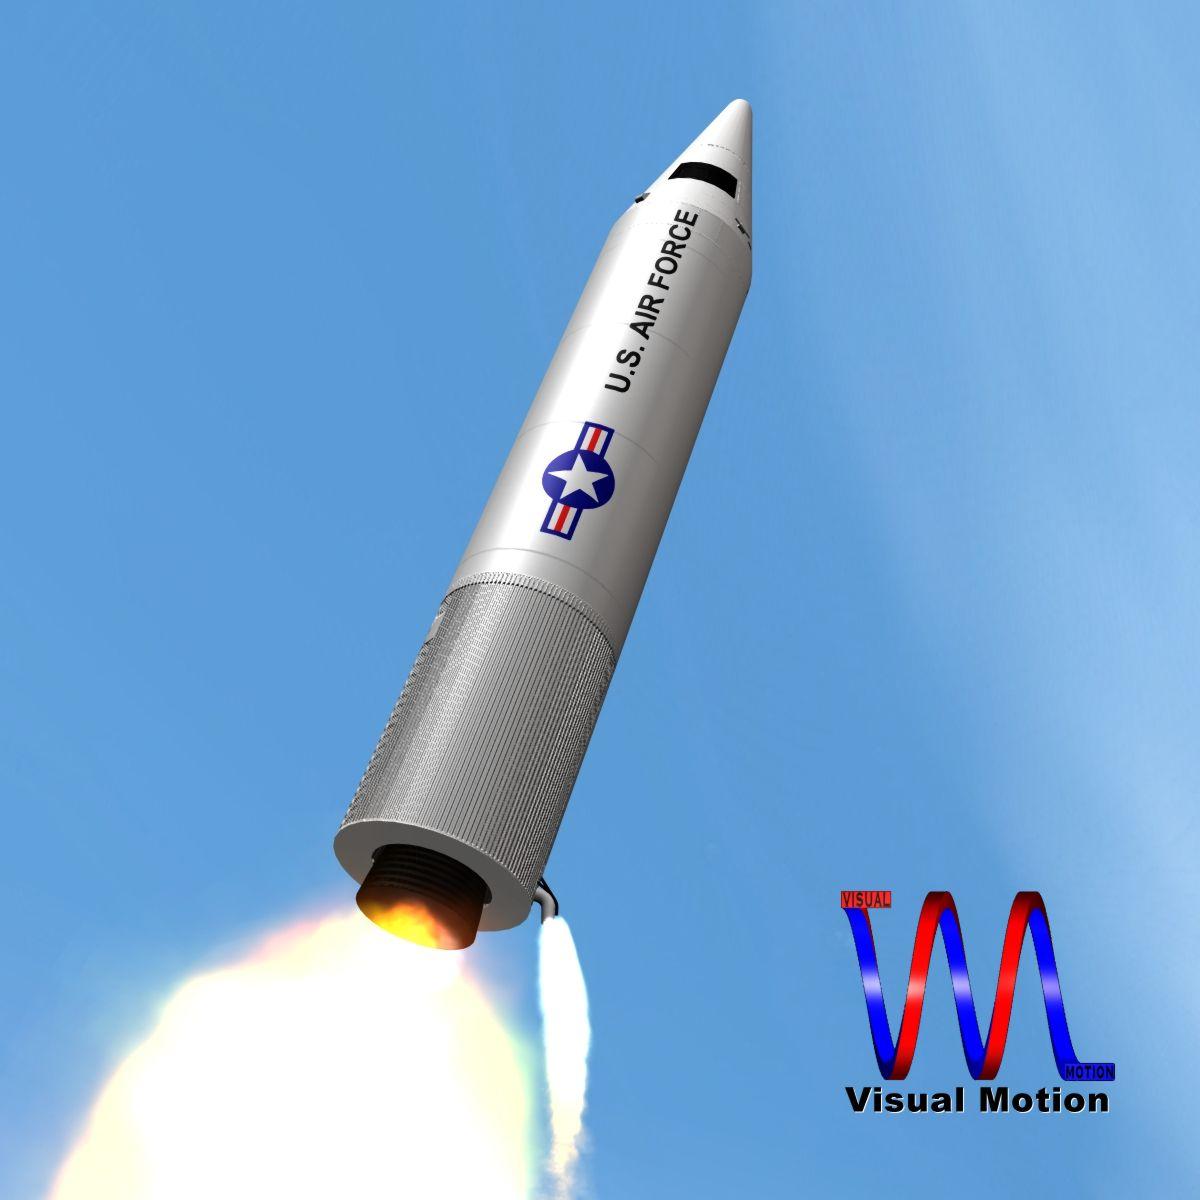 сансрын нитратын пуужин 3d загвар 3ds dxf x сагамхай scn obj 149768